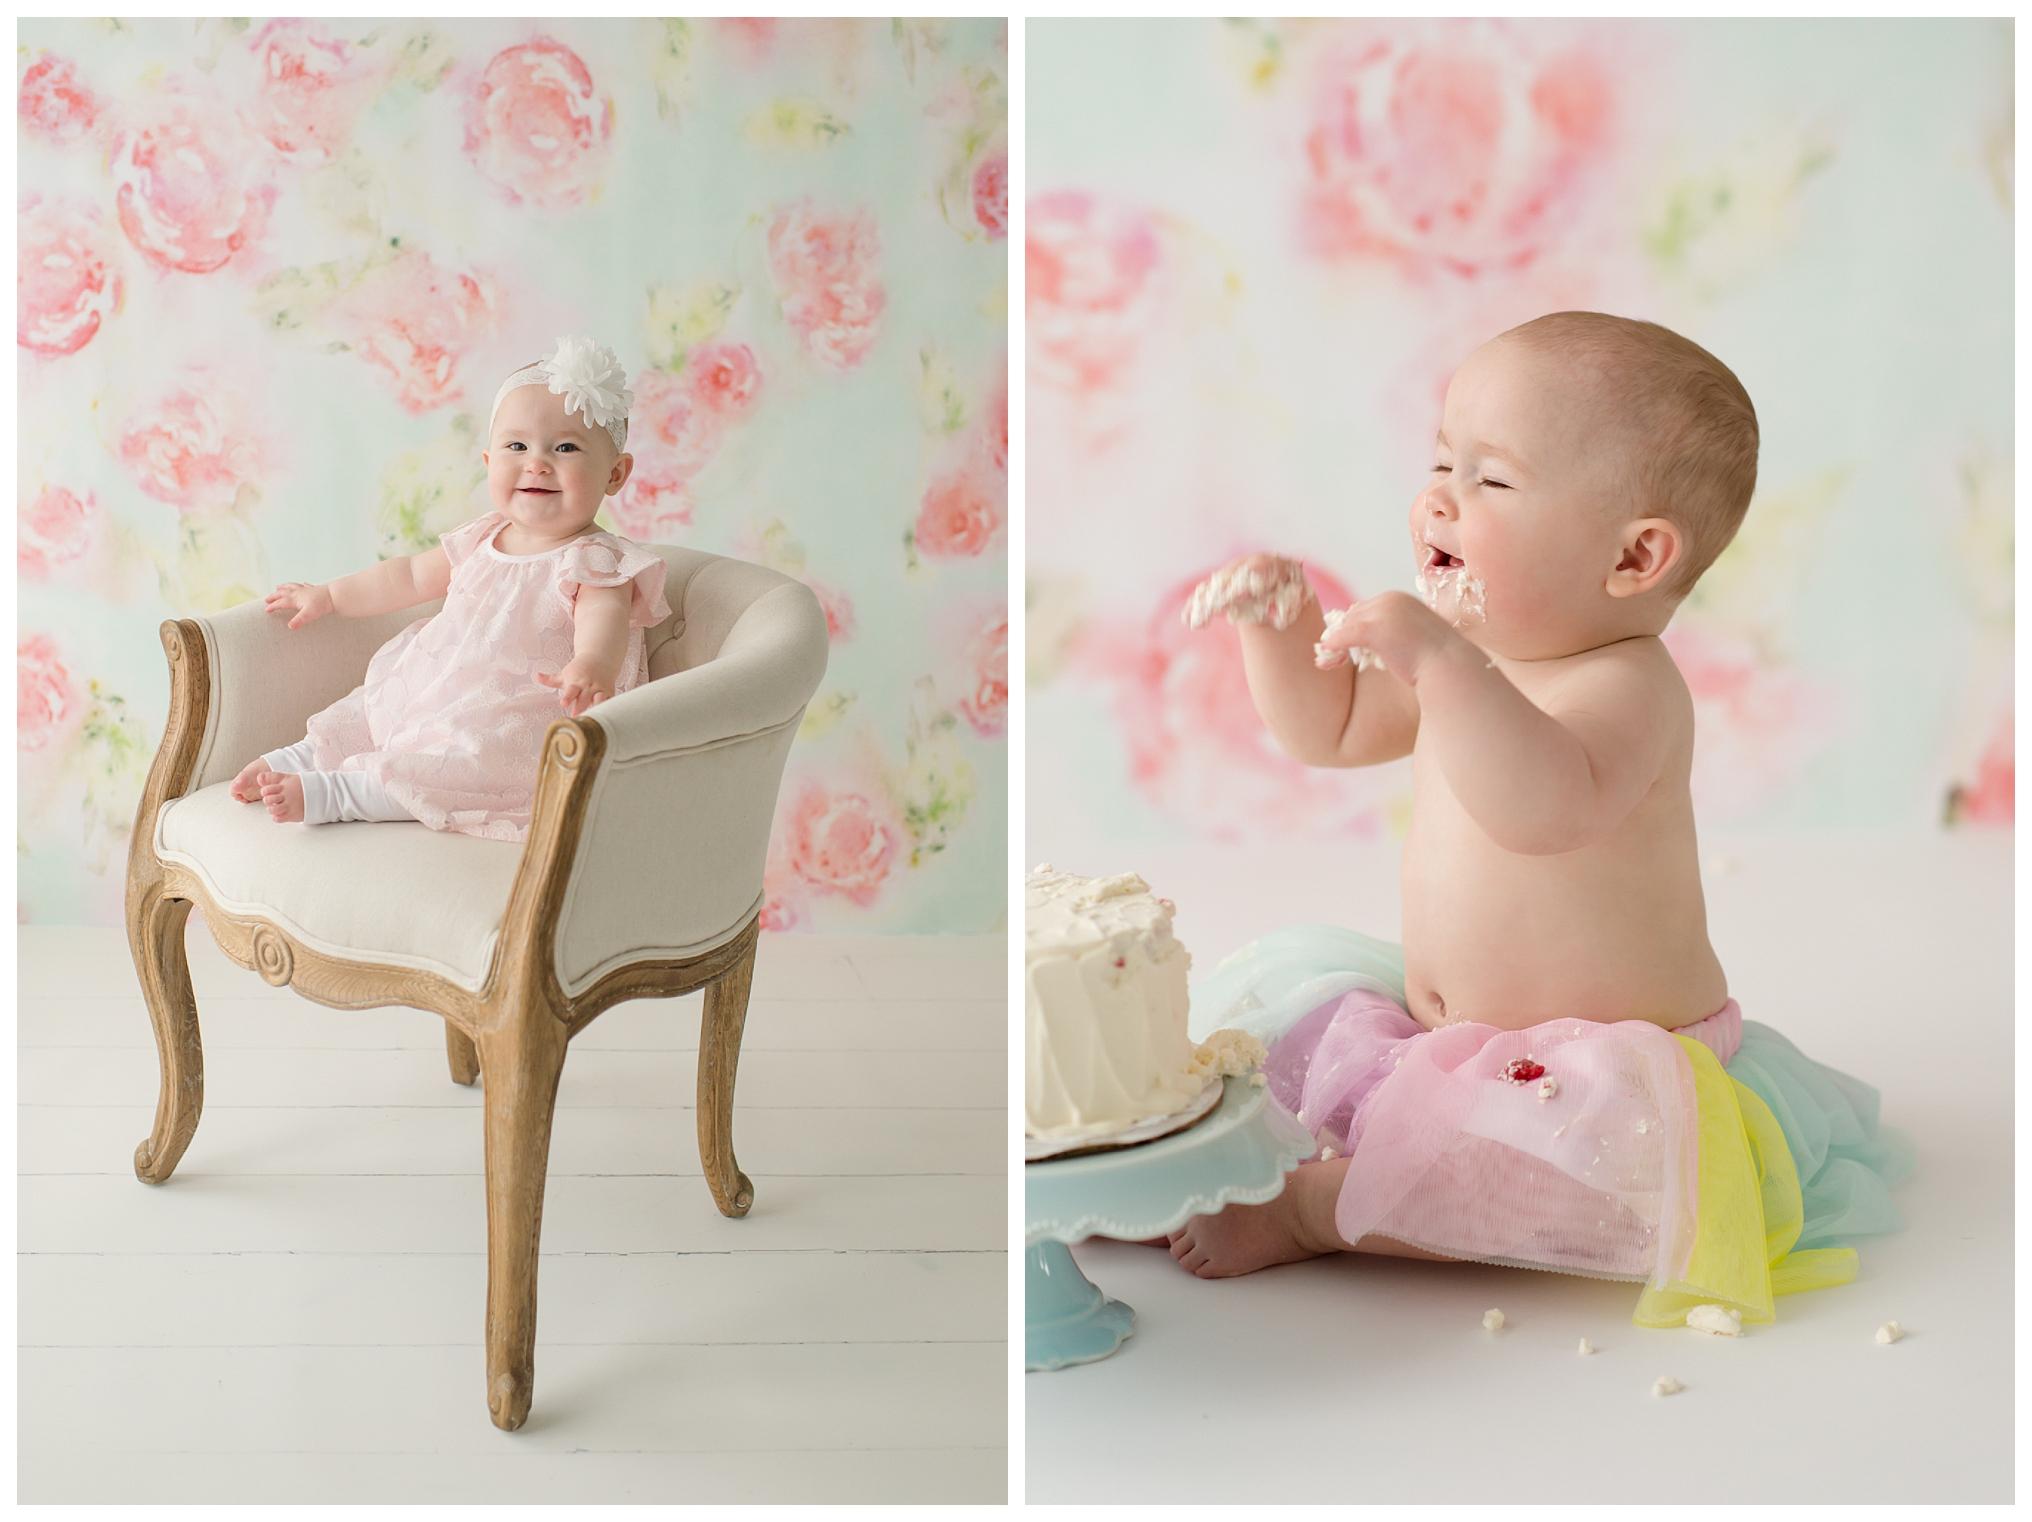 Maine-baby-photographer-sweet-light-portraits240.jpg